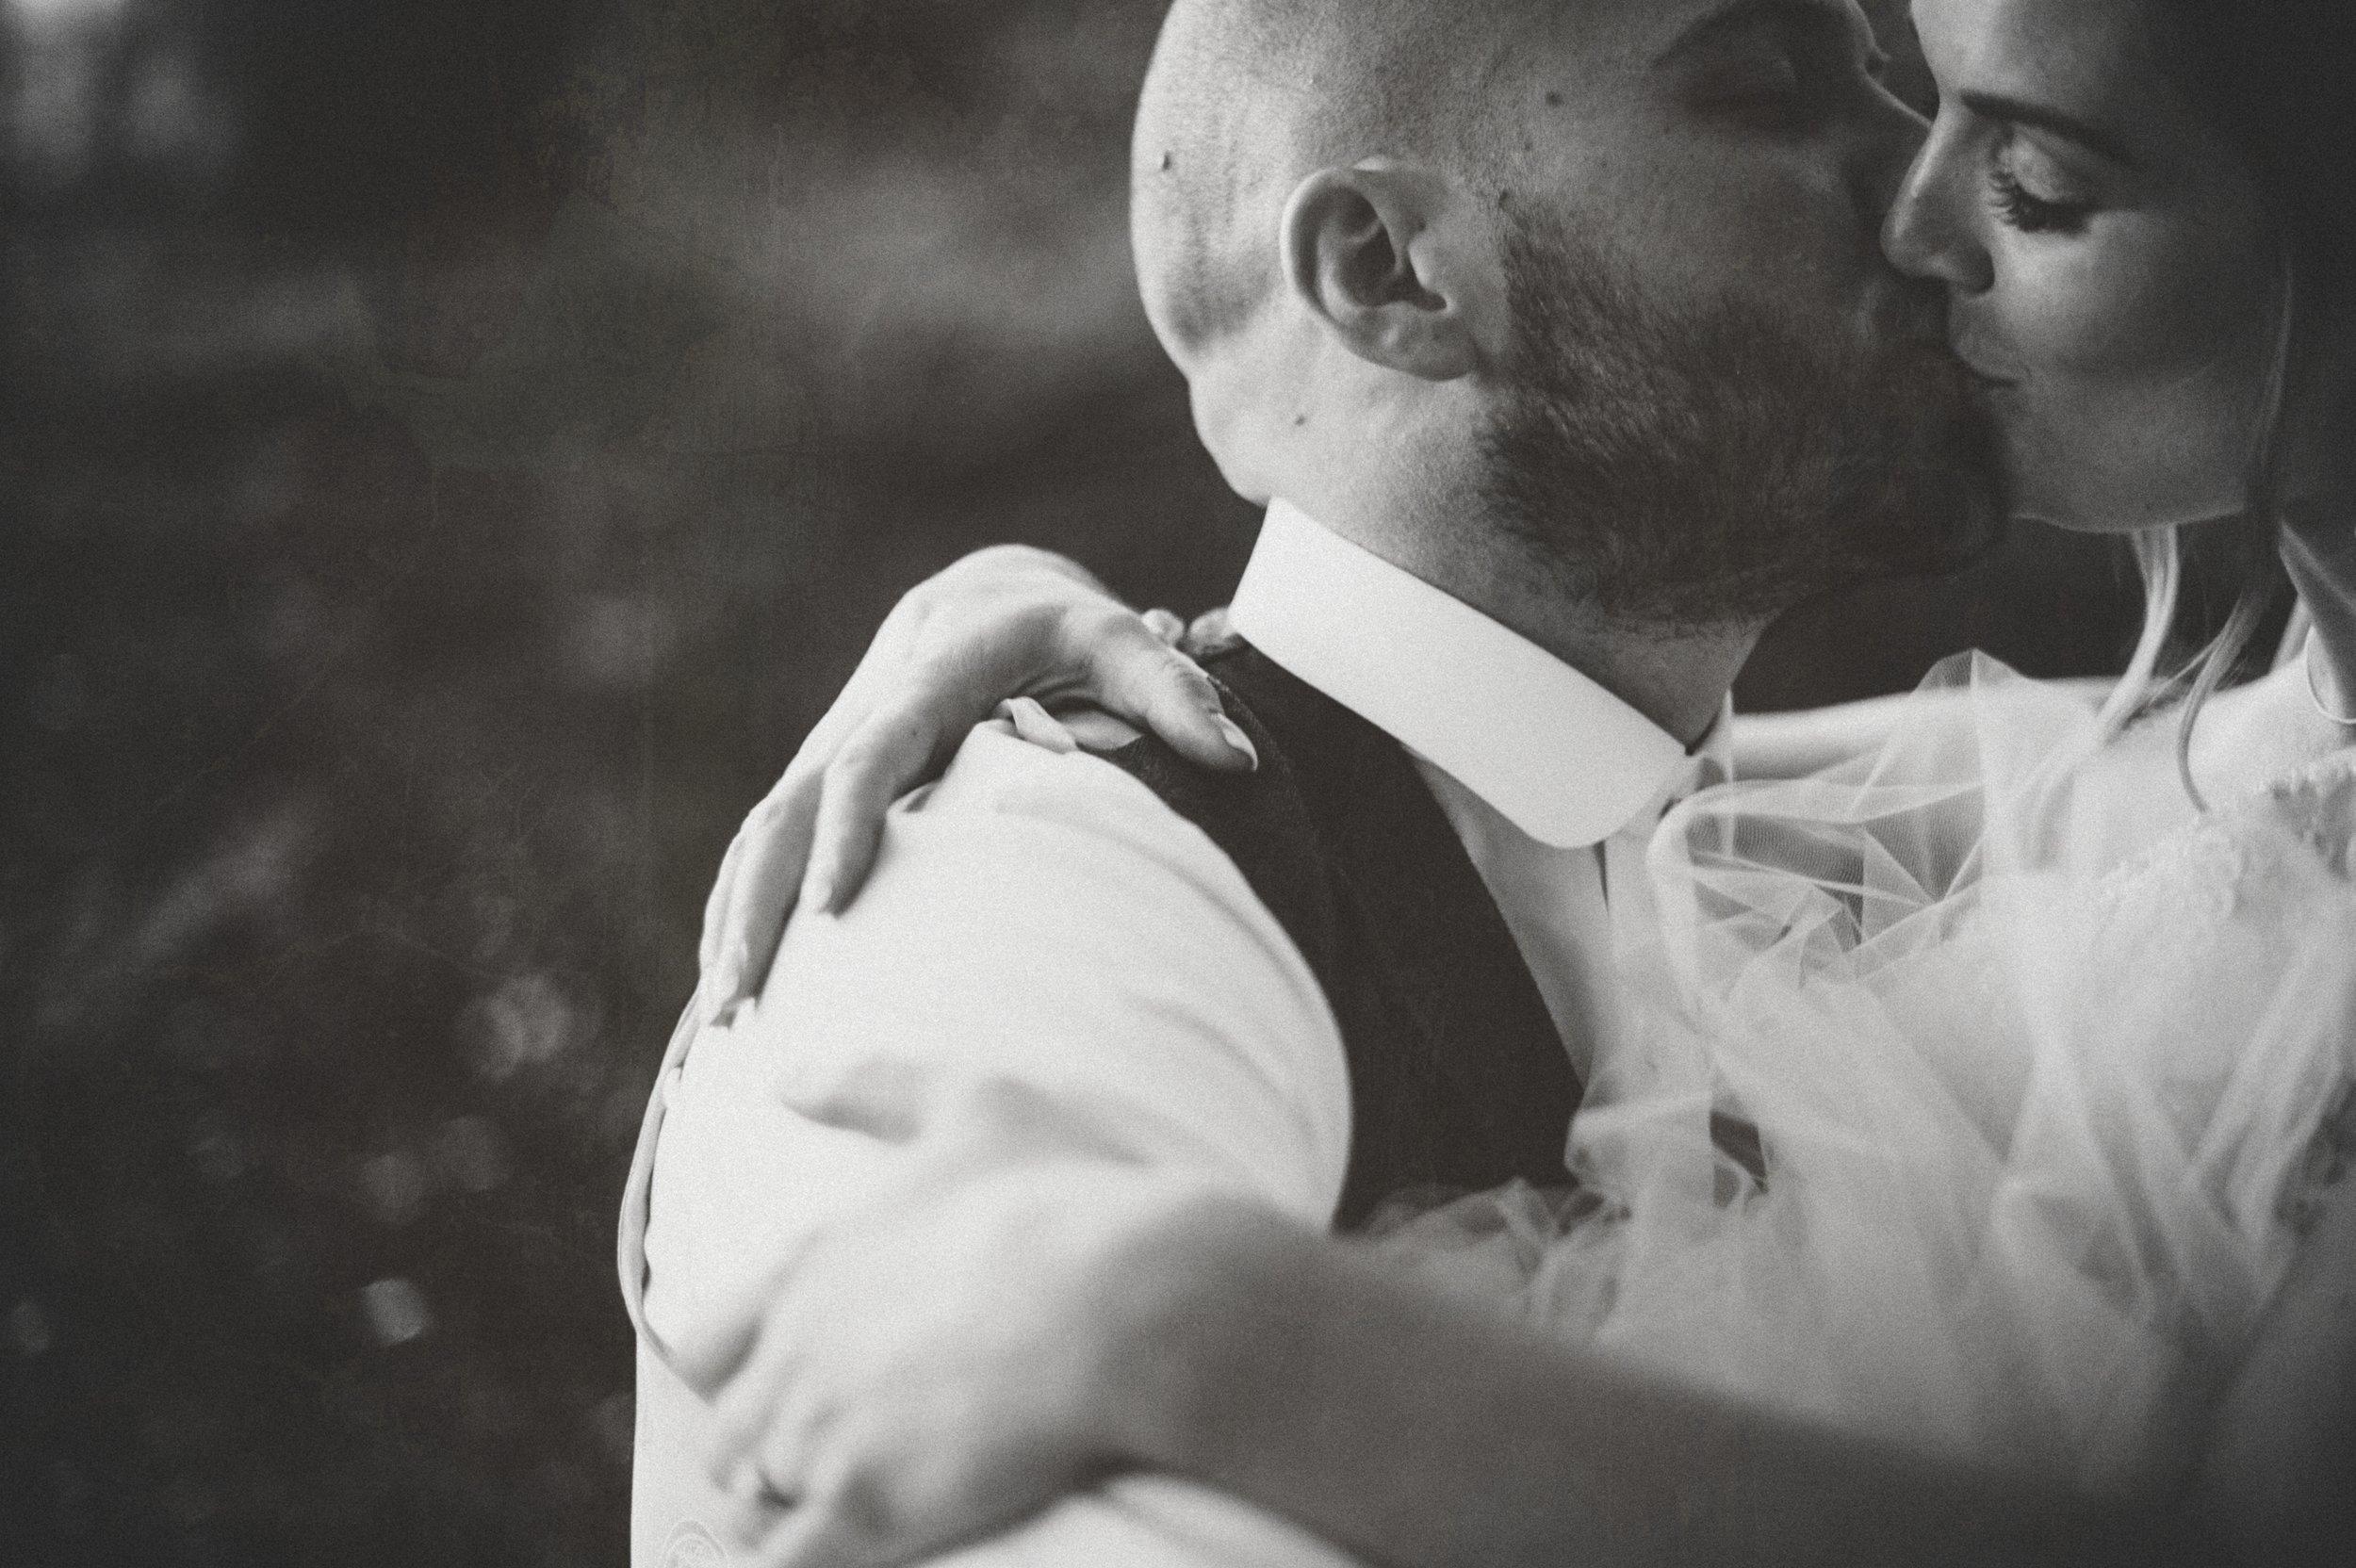 wedding photography north devon harrera images- 23.jpg